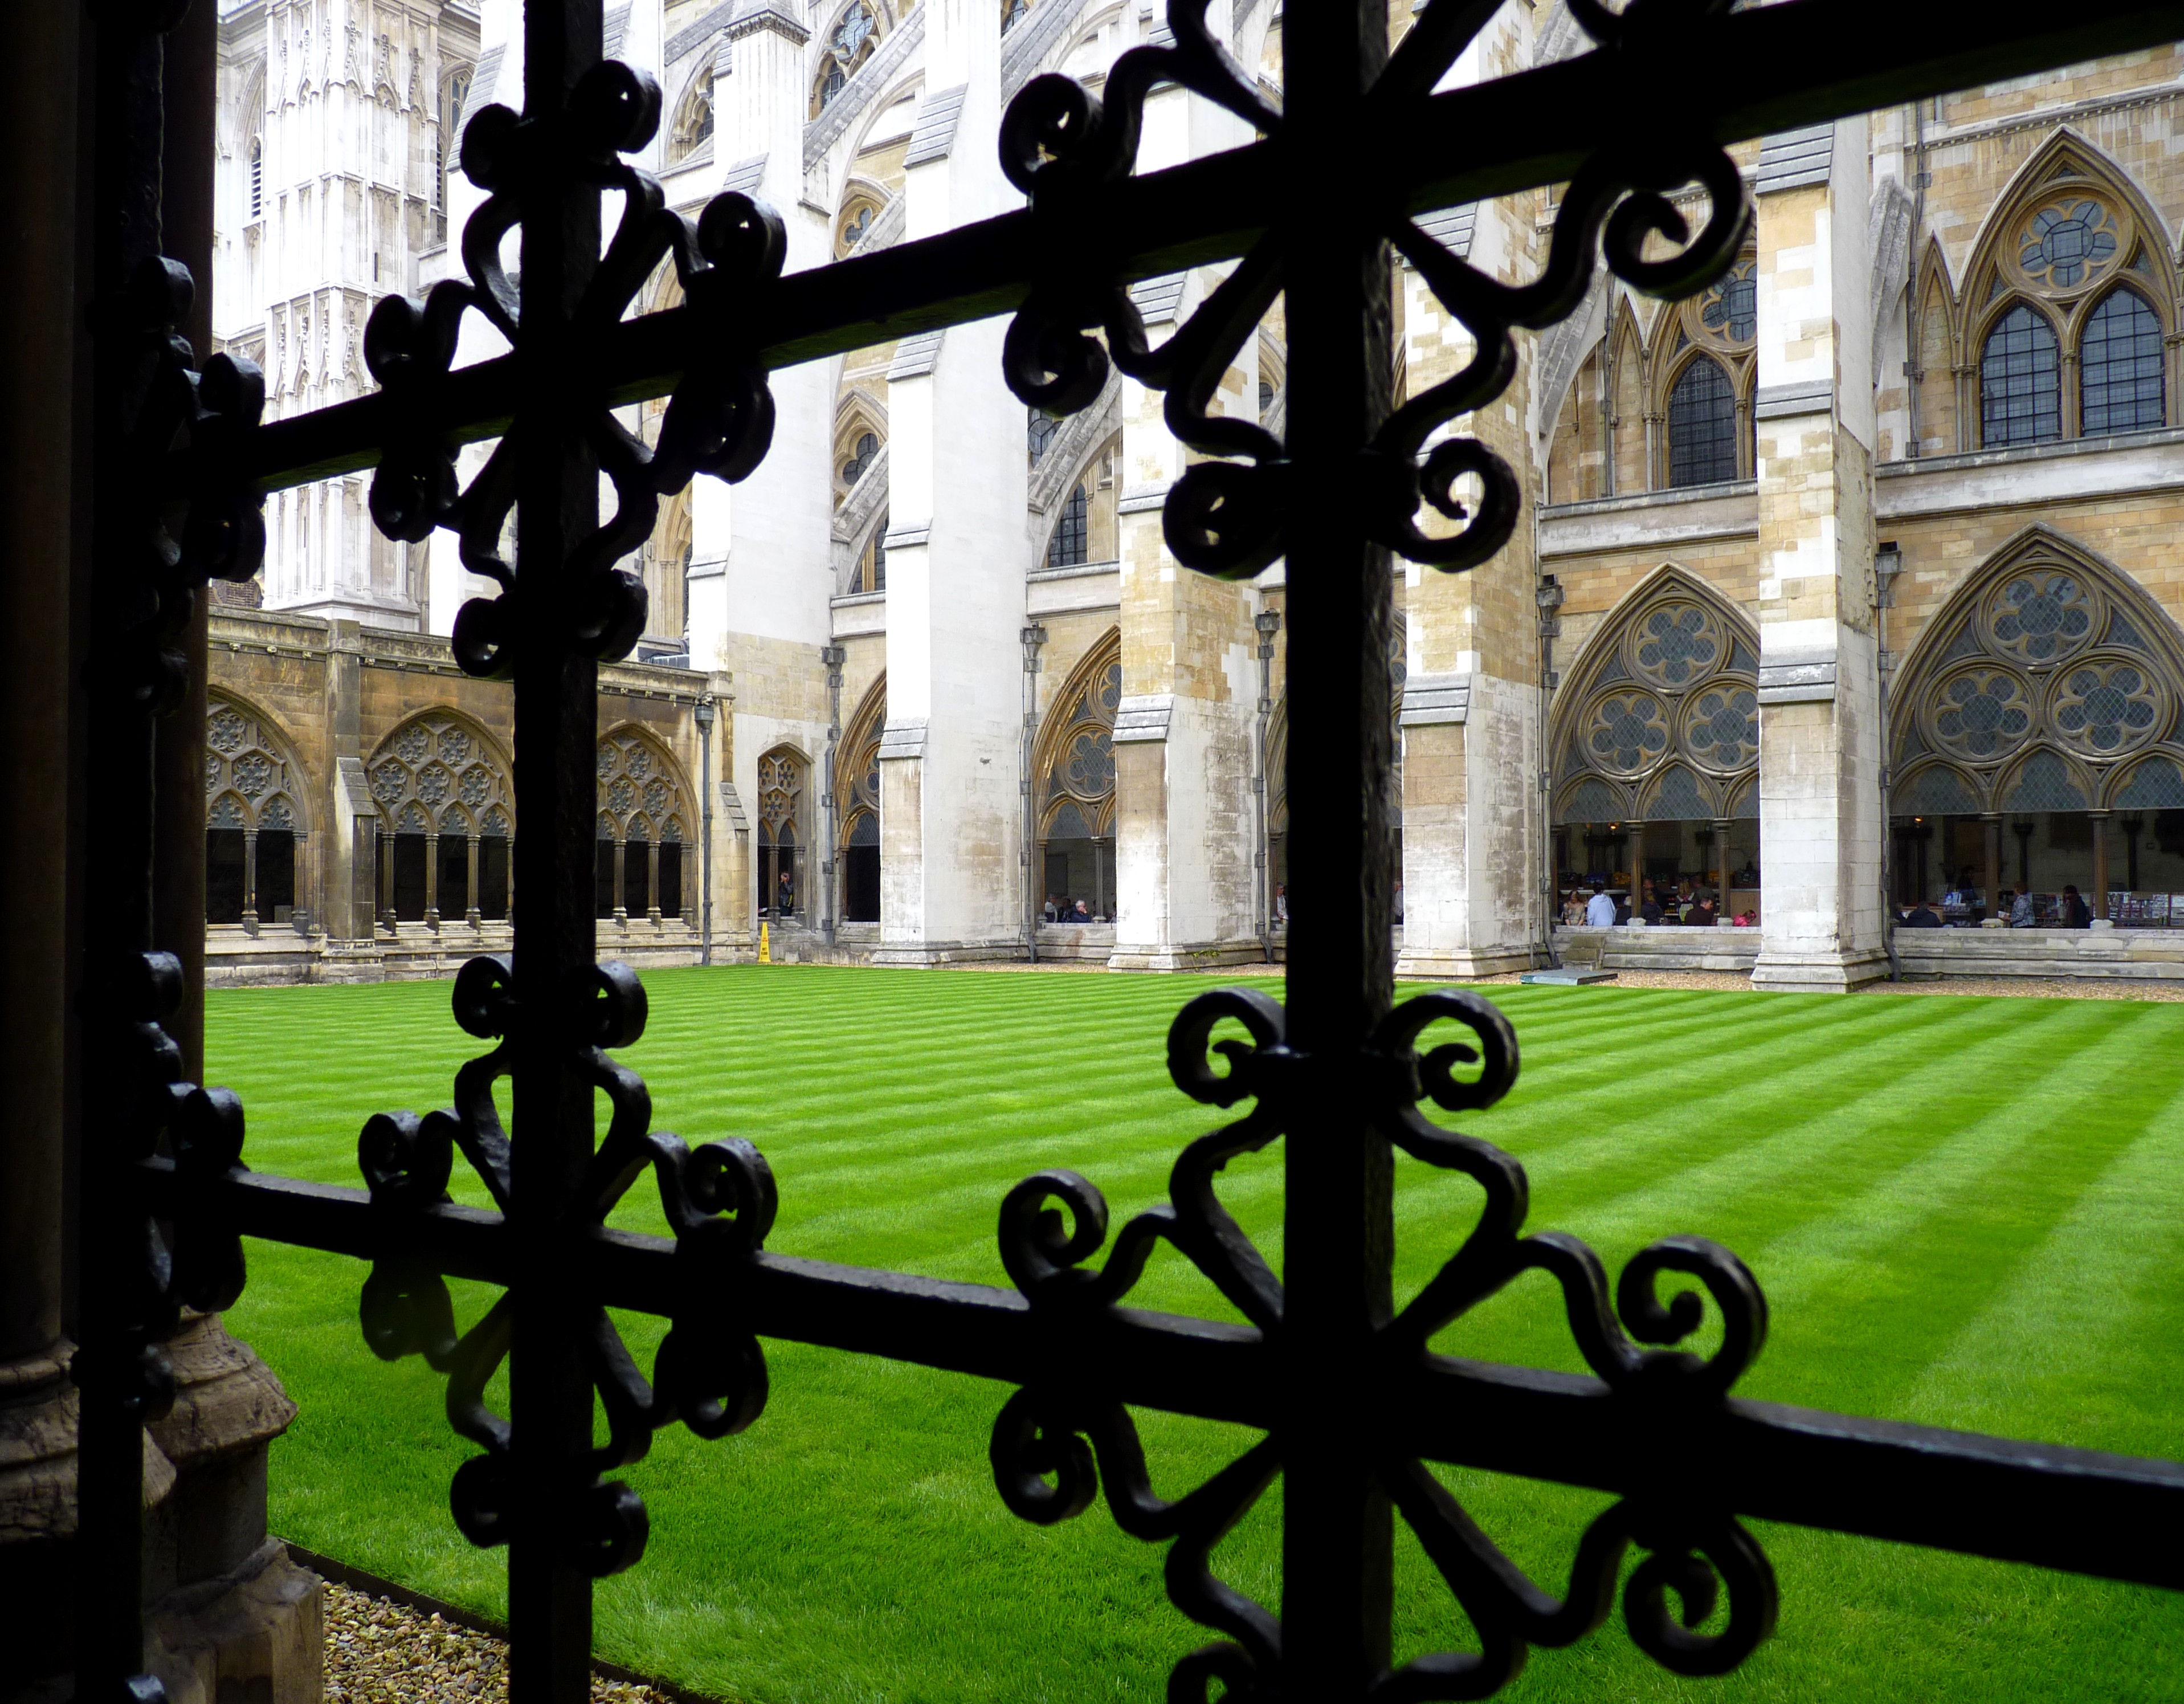 File:The Inner Garden Of The Westminster Abbey